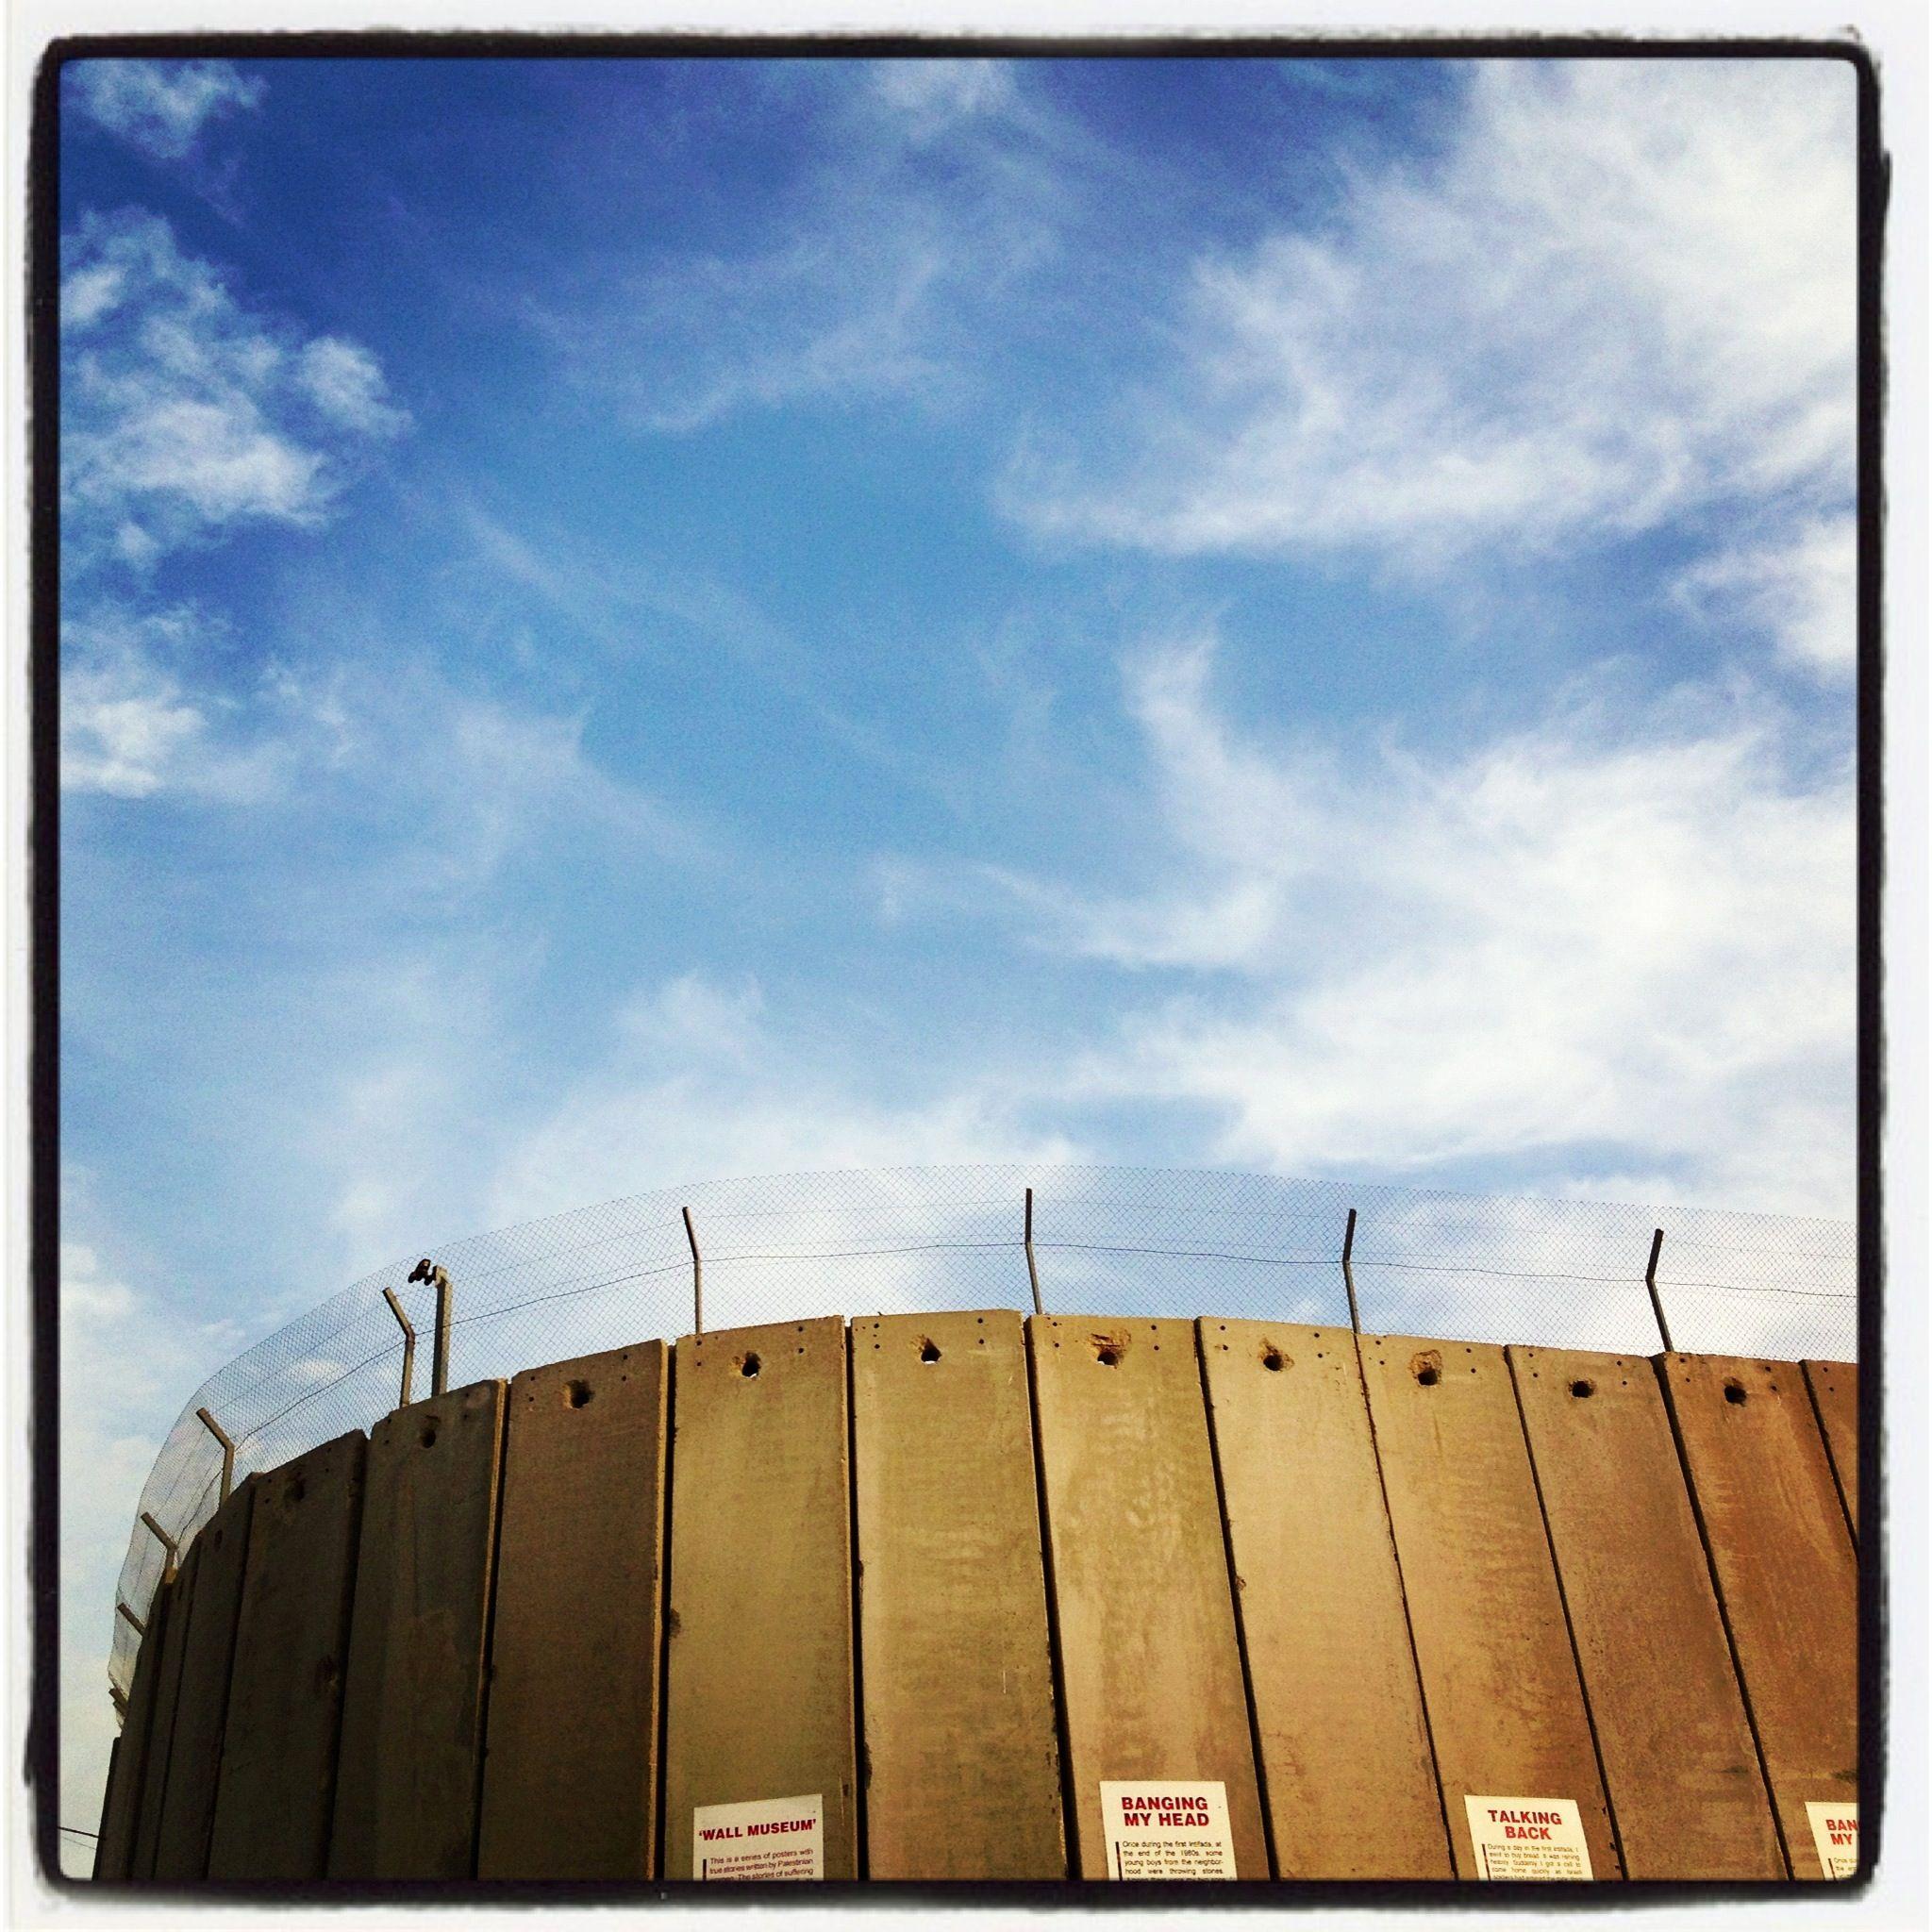 Wall beetwen Palestine and Israel